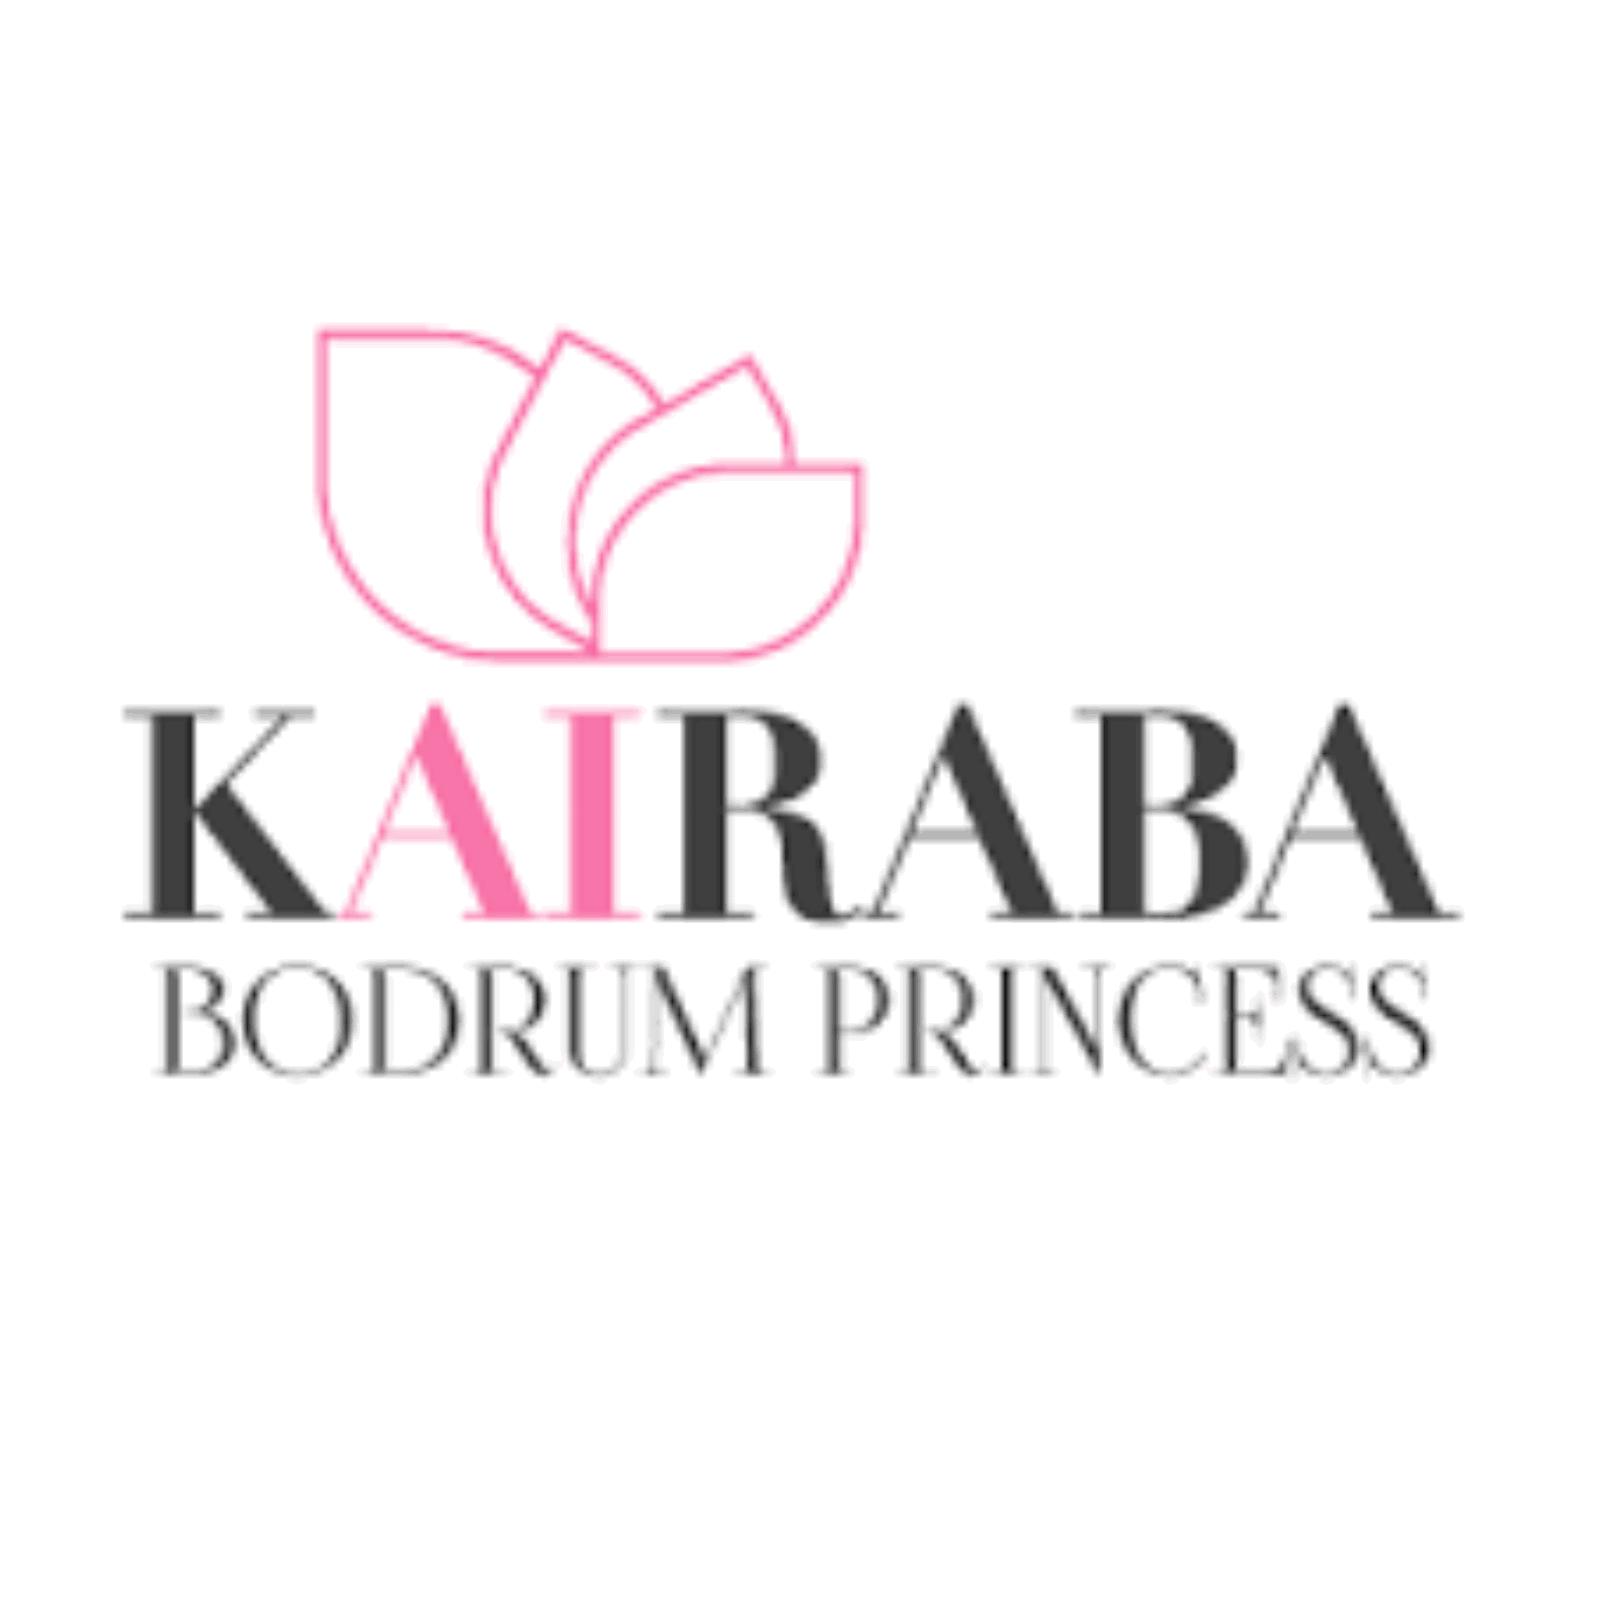 KAIRABA BODRUM PRINCESS